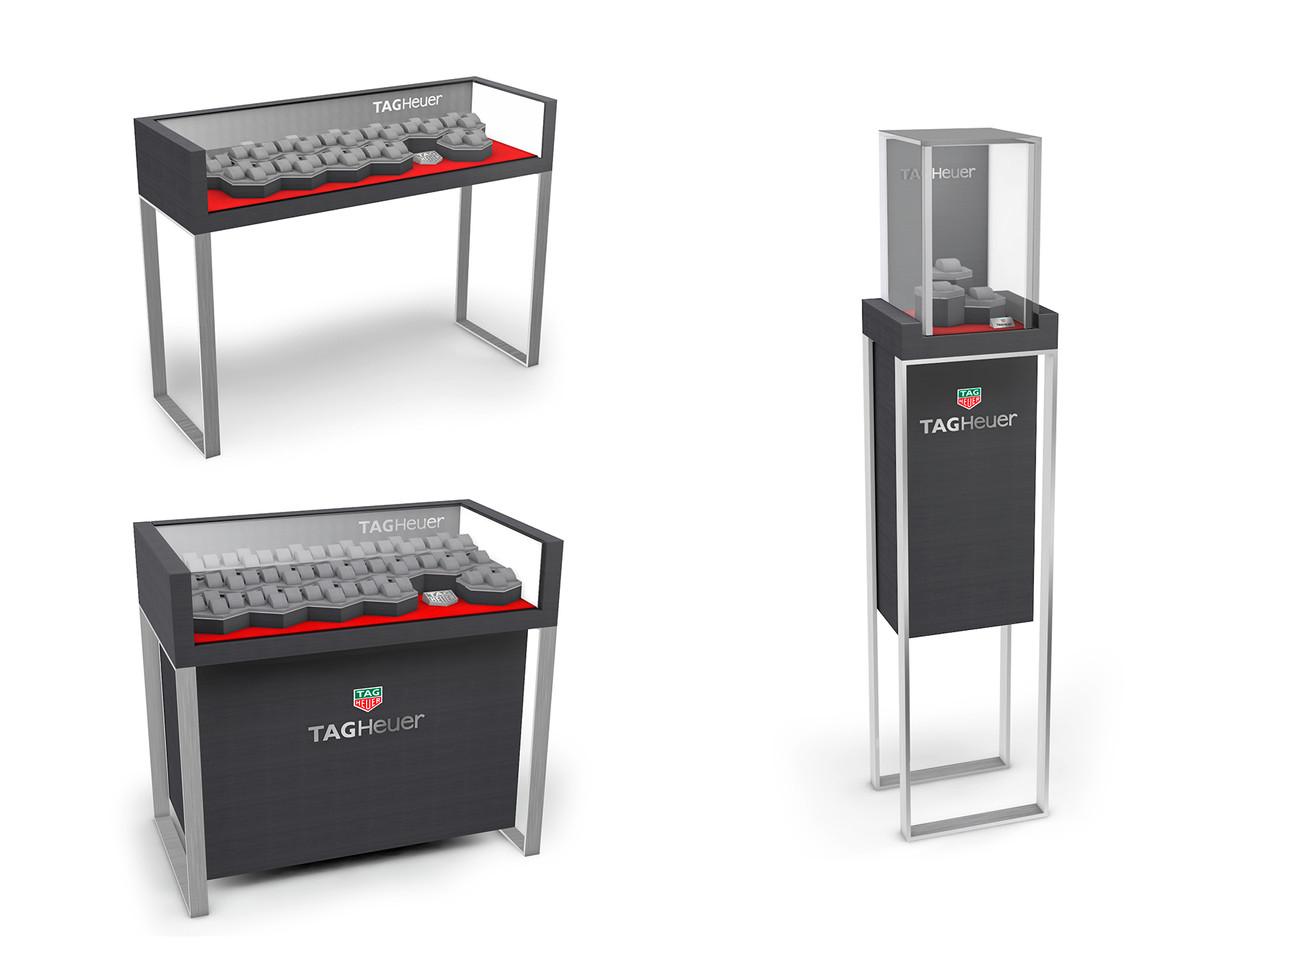 Corner Concept Furniture - Counter & Tower Showcases